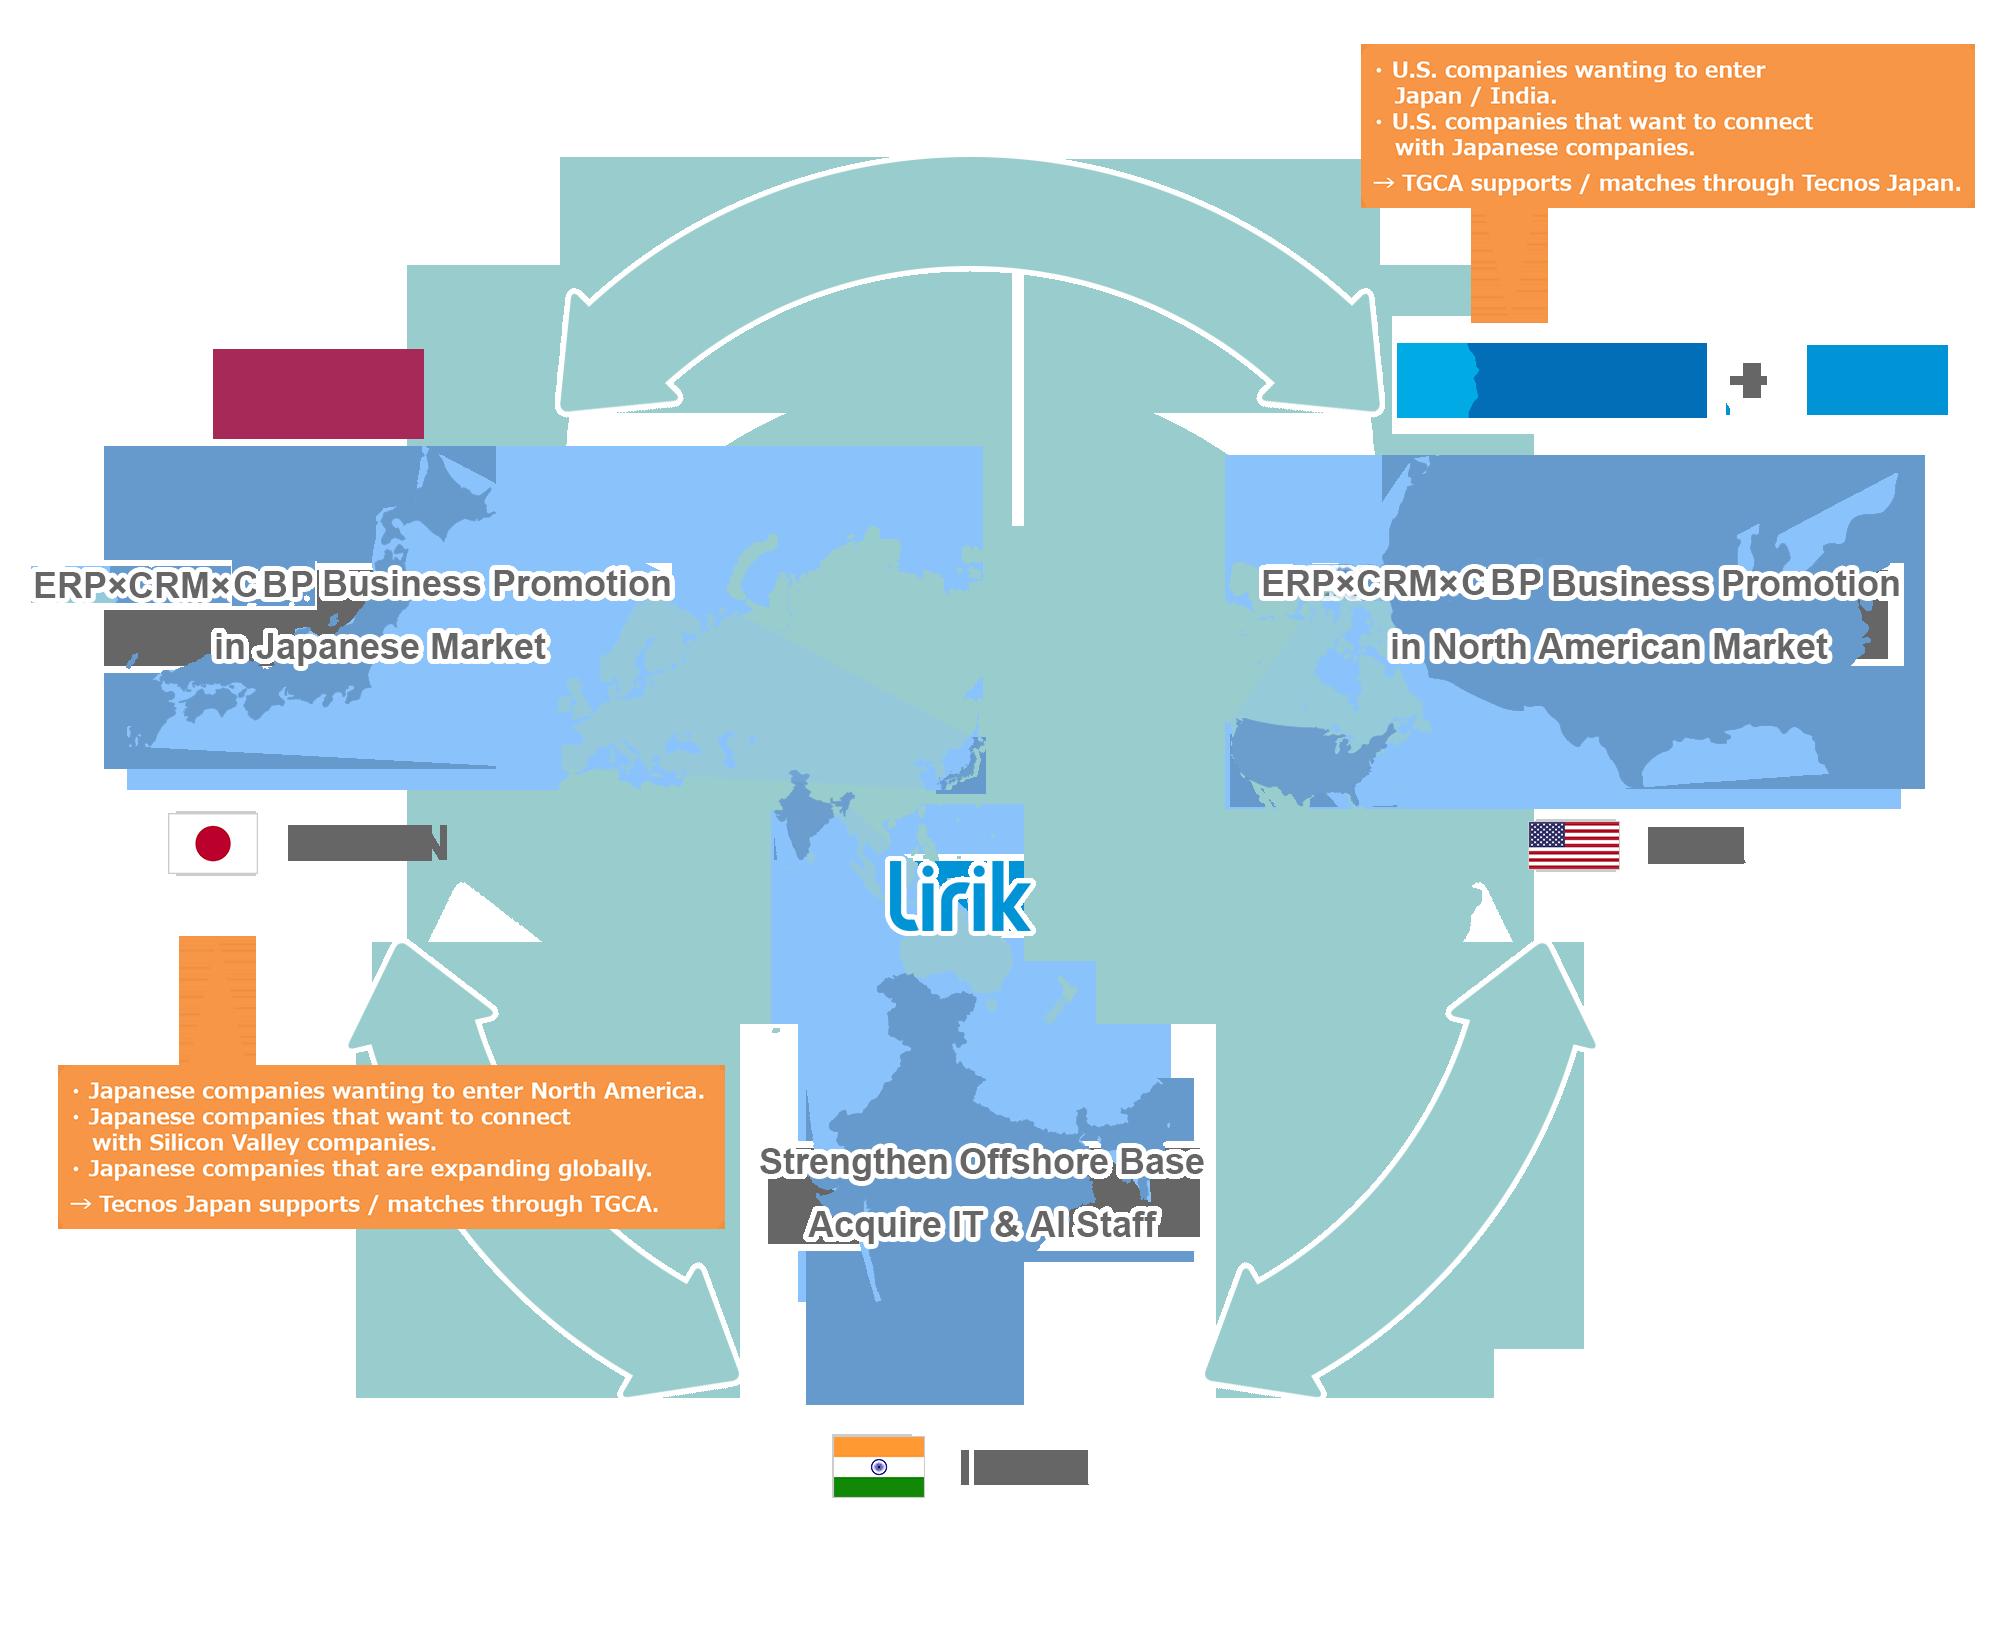 TECNOS GLOBAL COMPANY OF AMERICA.